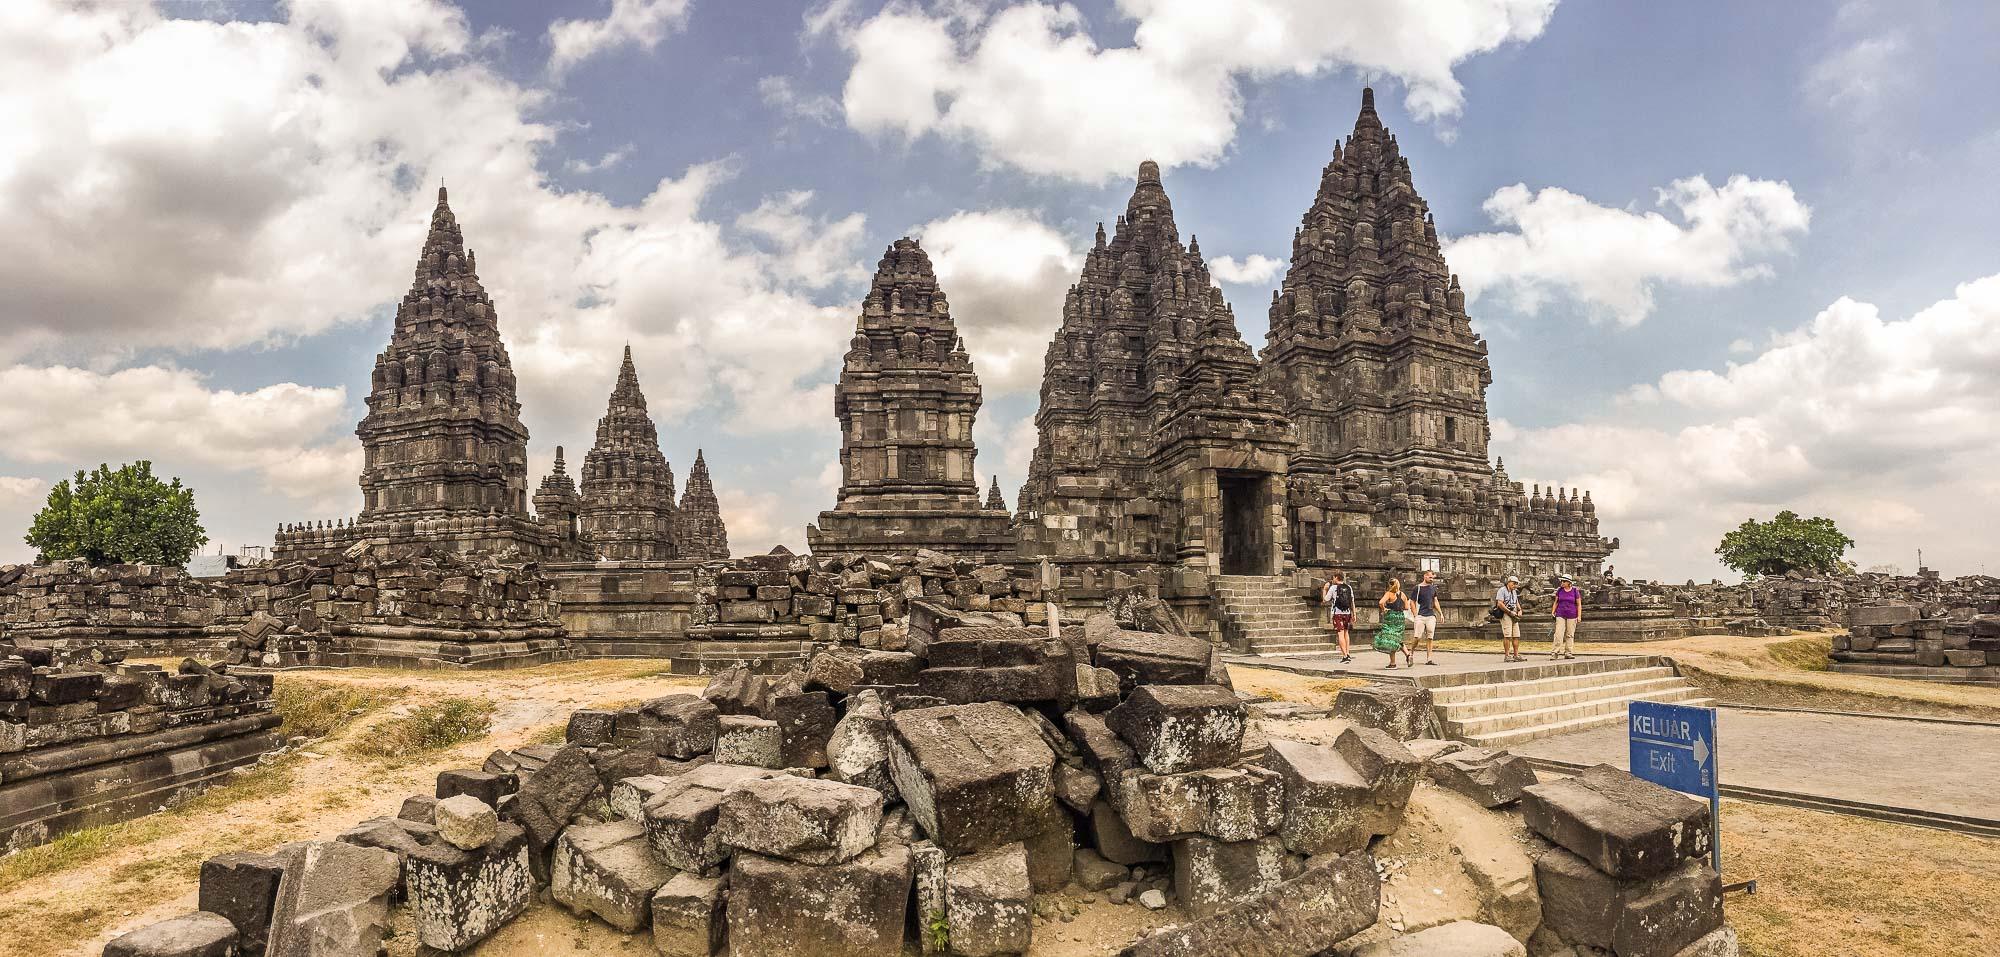 INDONESIA_2015_02 BOROBODUR-PRAMBANAN-YOGYA_JusMedic_245